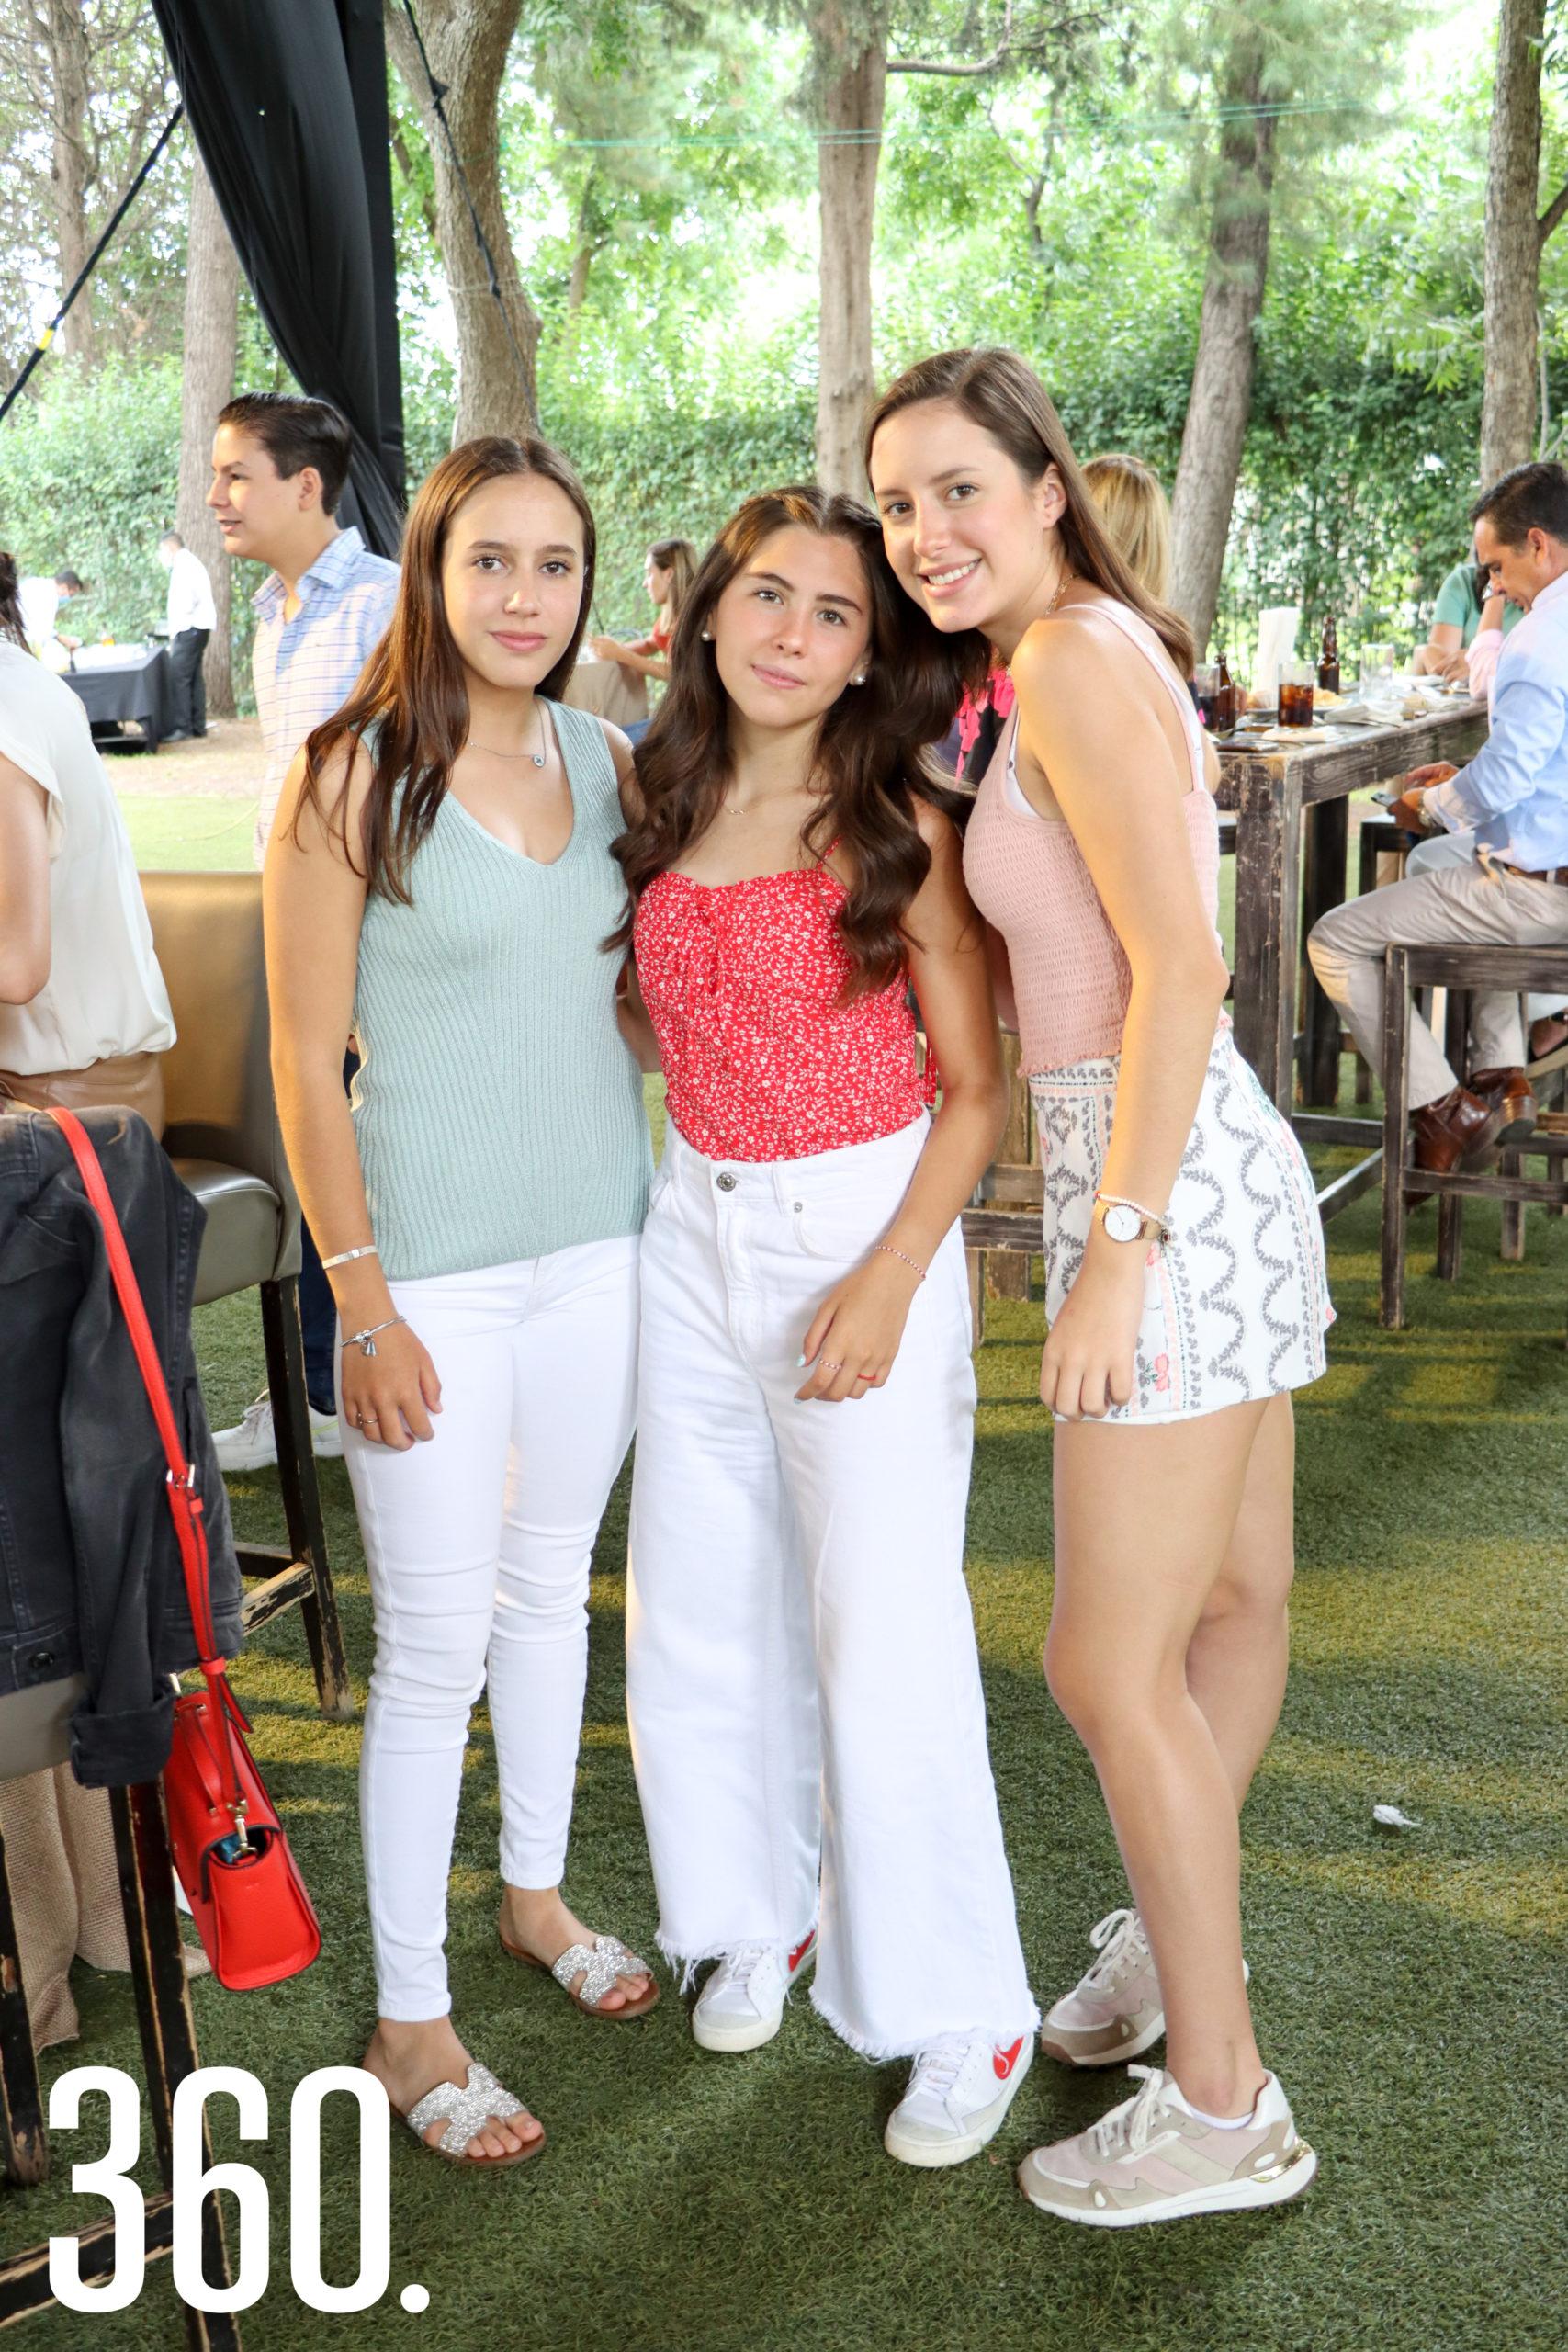 Paulina Colunga, María Sofía Montemayor y María Colunga.